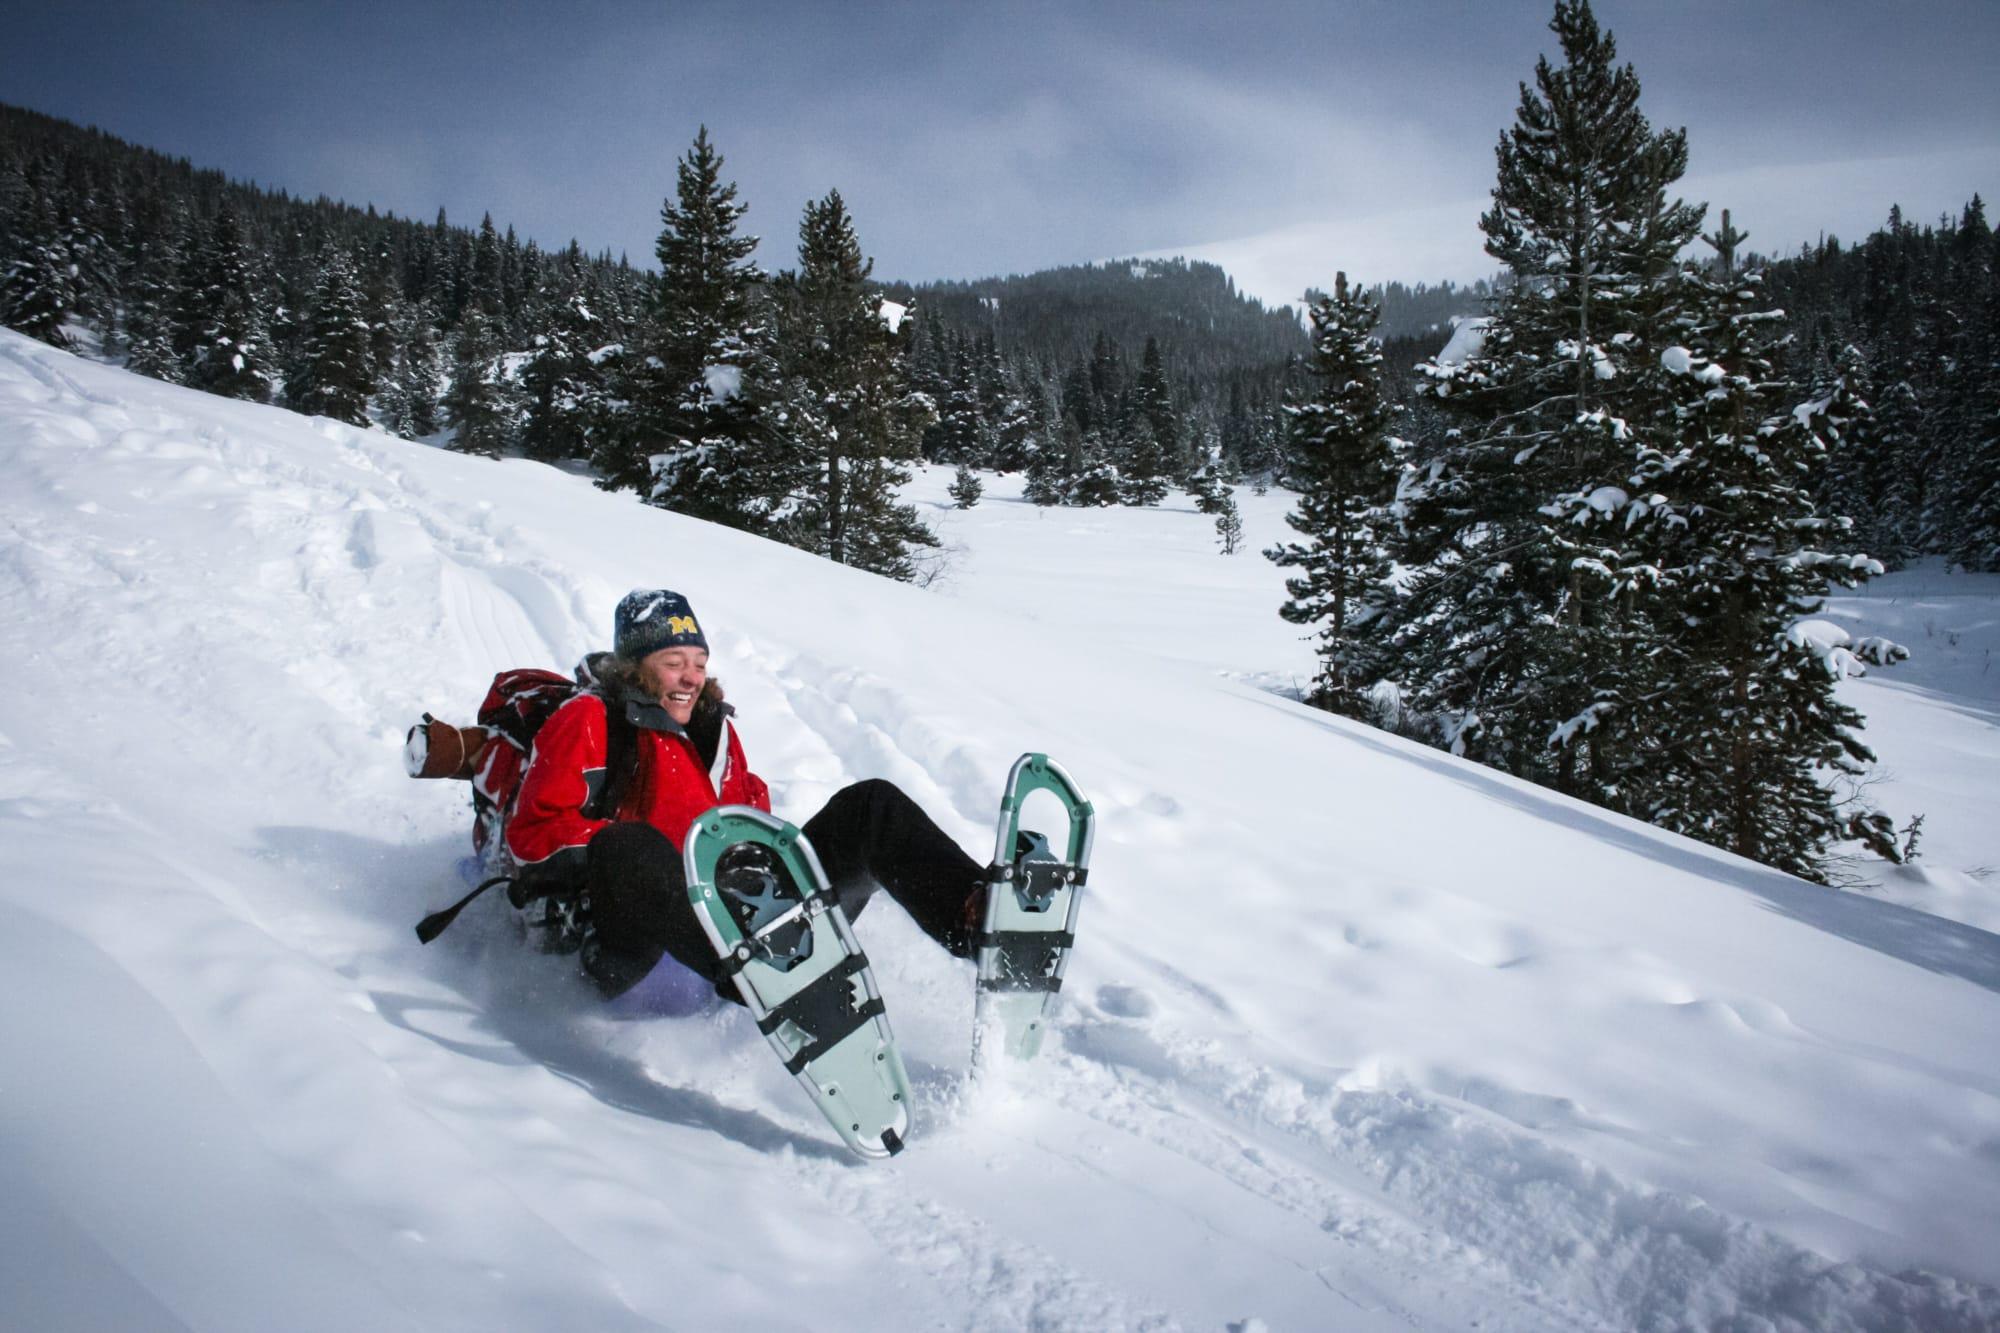 Reasons to take a backcountry hut trip - #11: Backcountry sledding